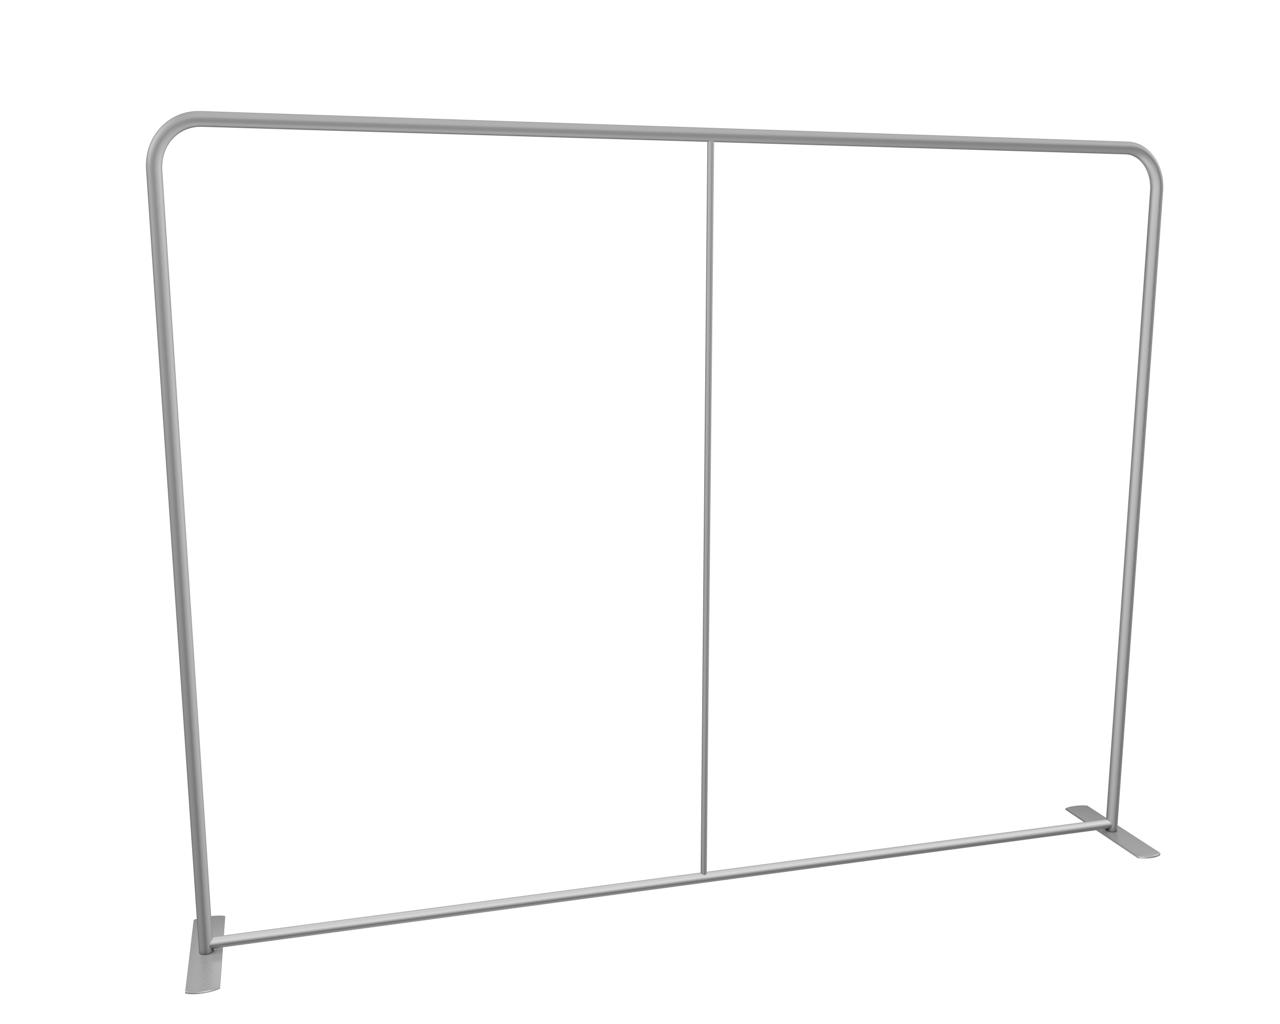 Waveline Media Panel F Frame